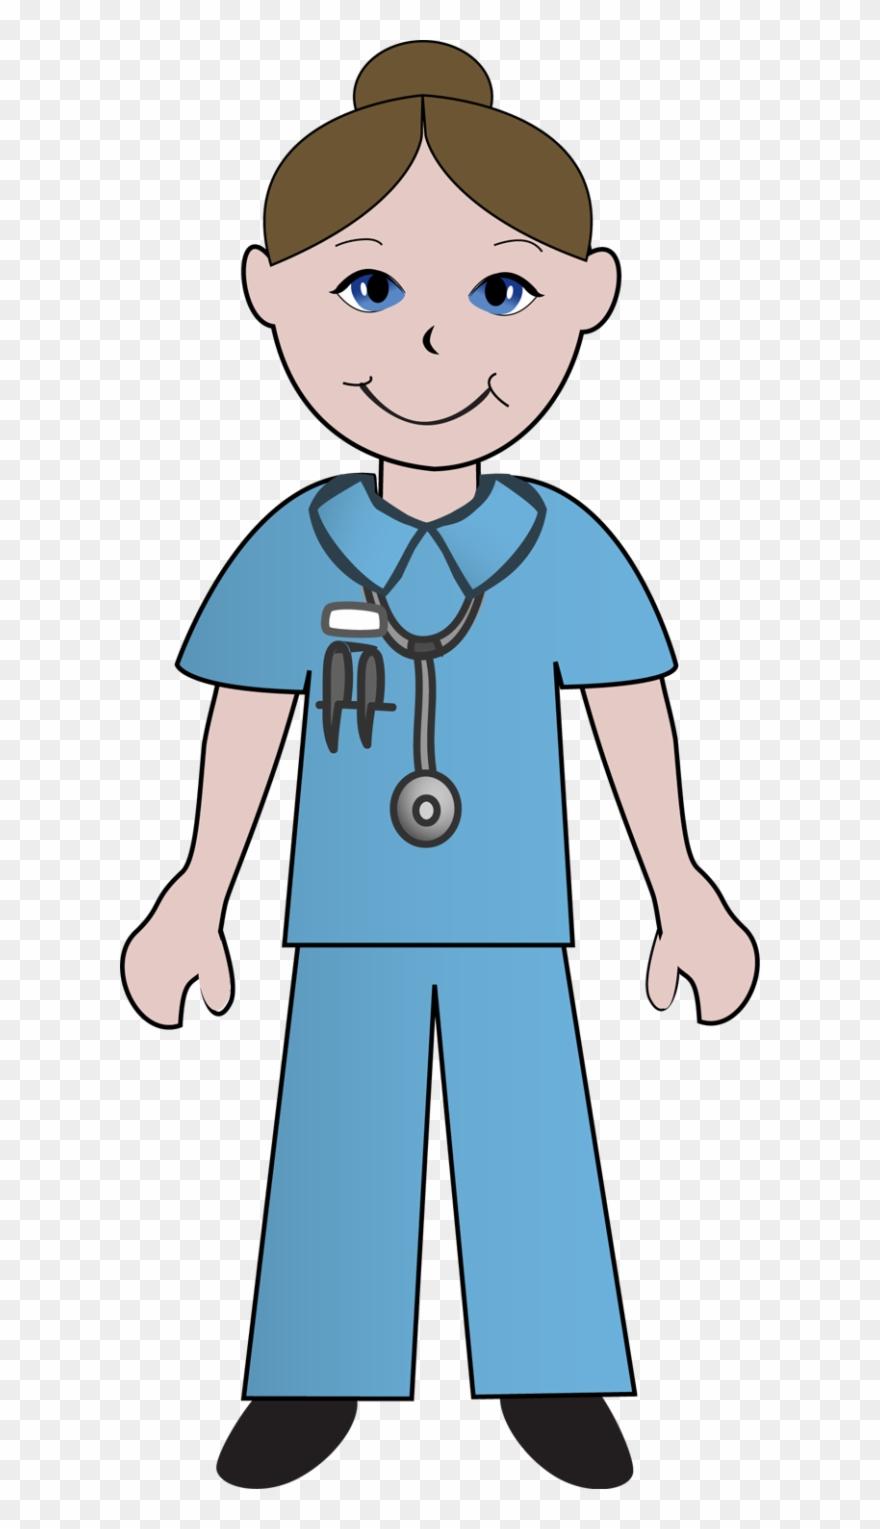 School nurse cartoon clipart svg royalty free download Free Clip Art School Nurse Clipart Image - Clip Art Cute ... svg royalty free download